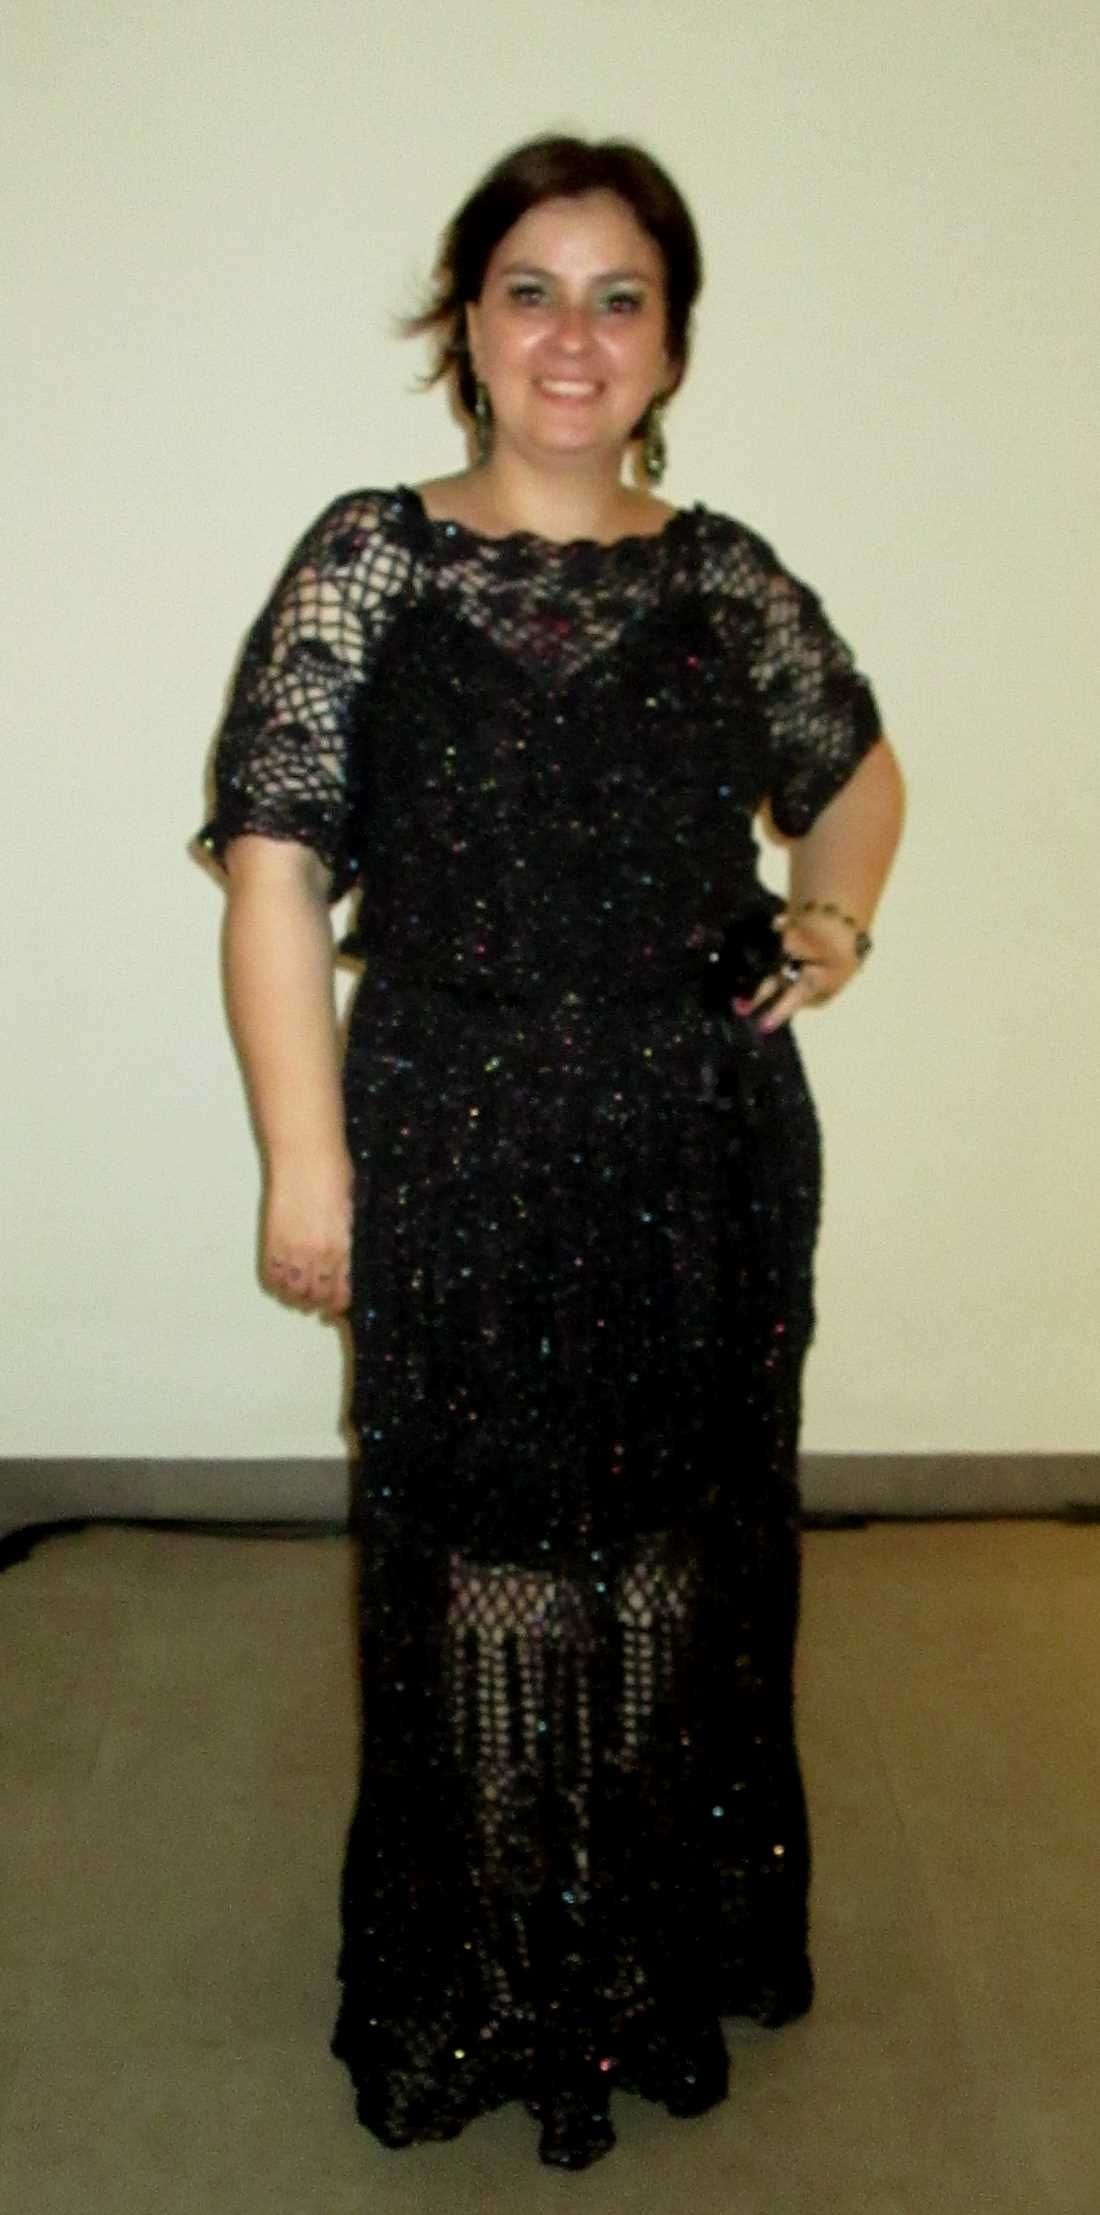 Vestido de crochet preto com brilho furta-cor.